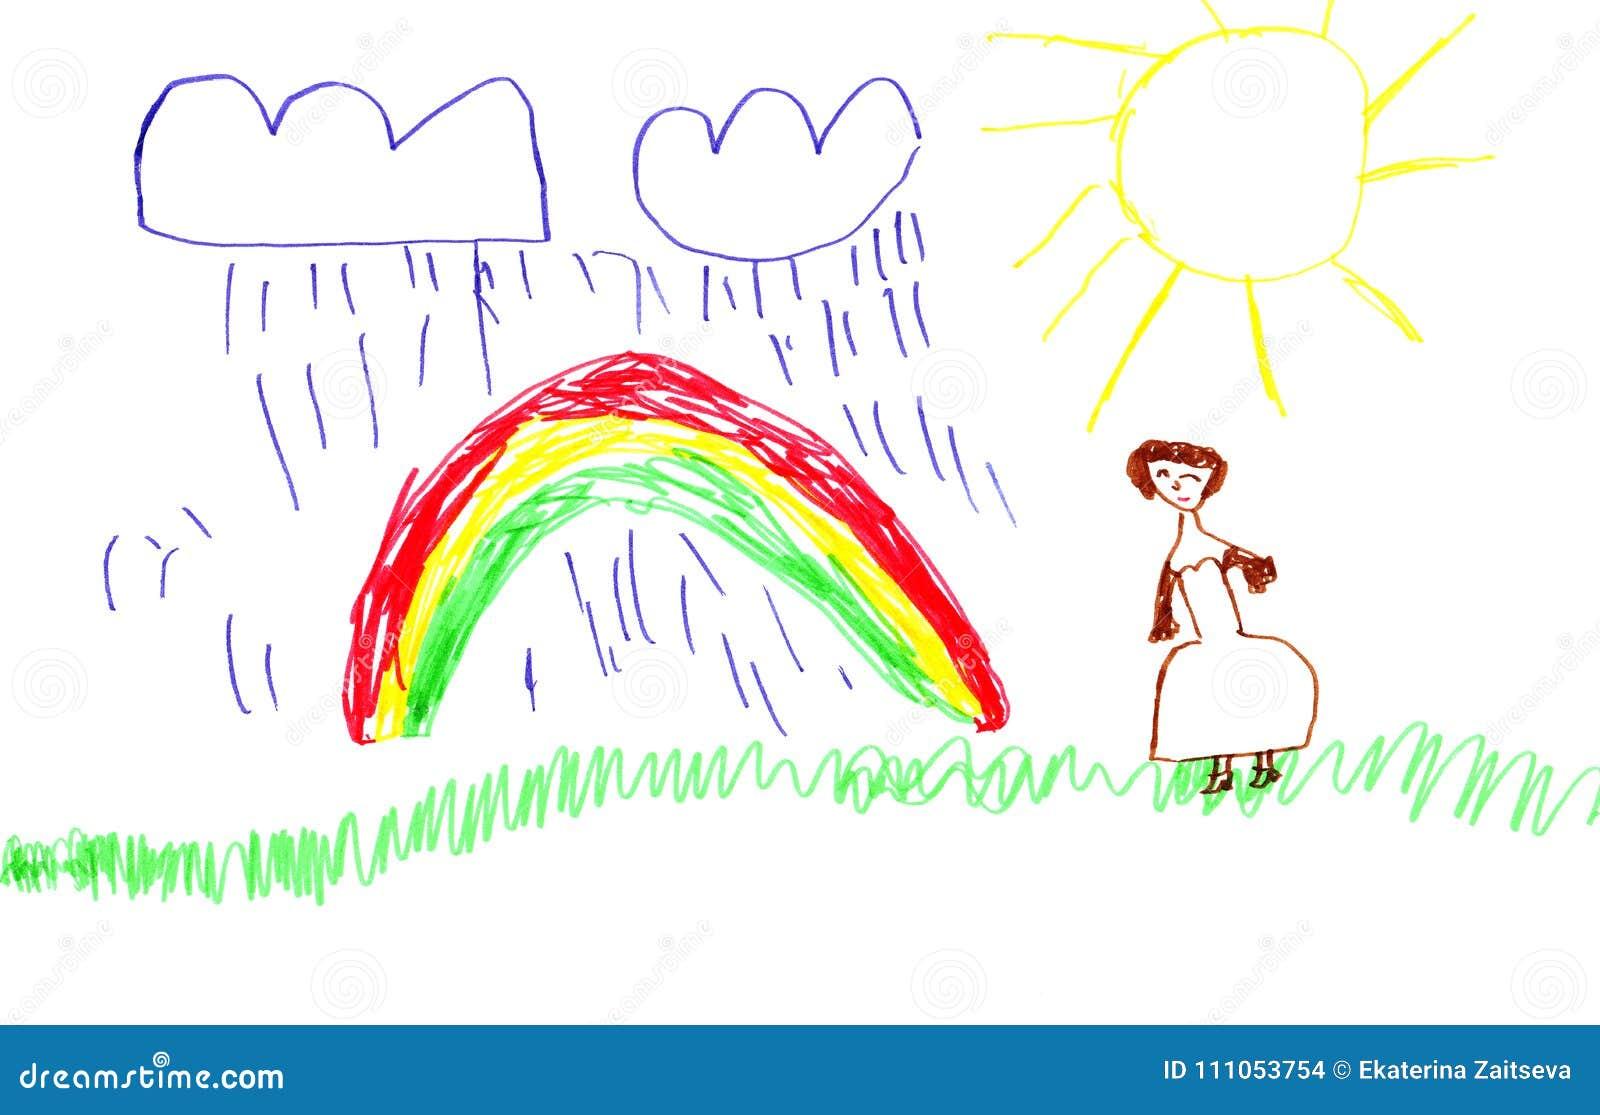 Bright Colorful Marker Handdrawn Child Rainbow Picture Stock